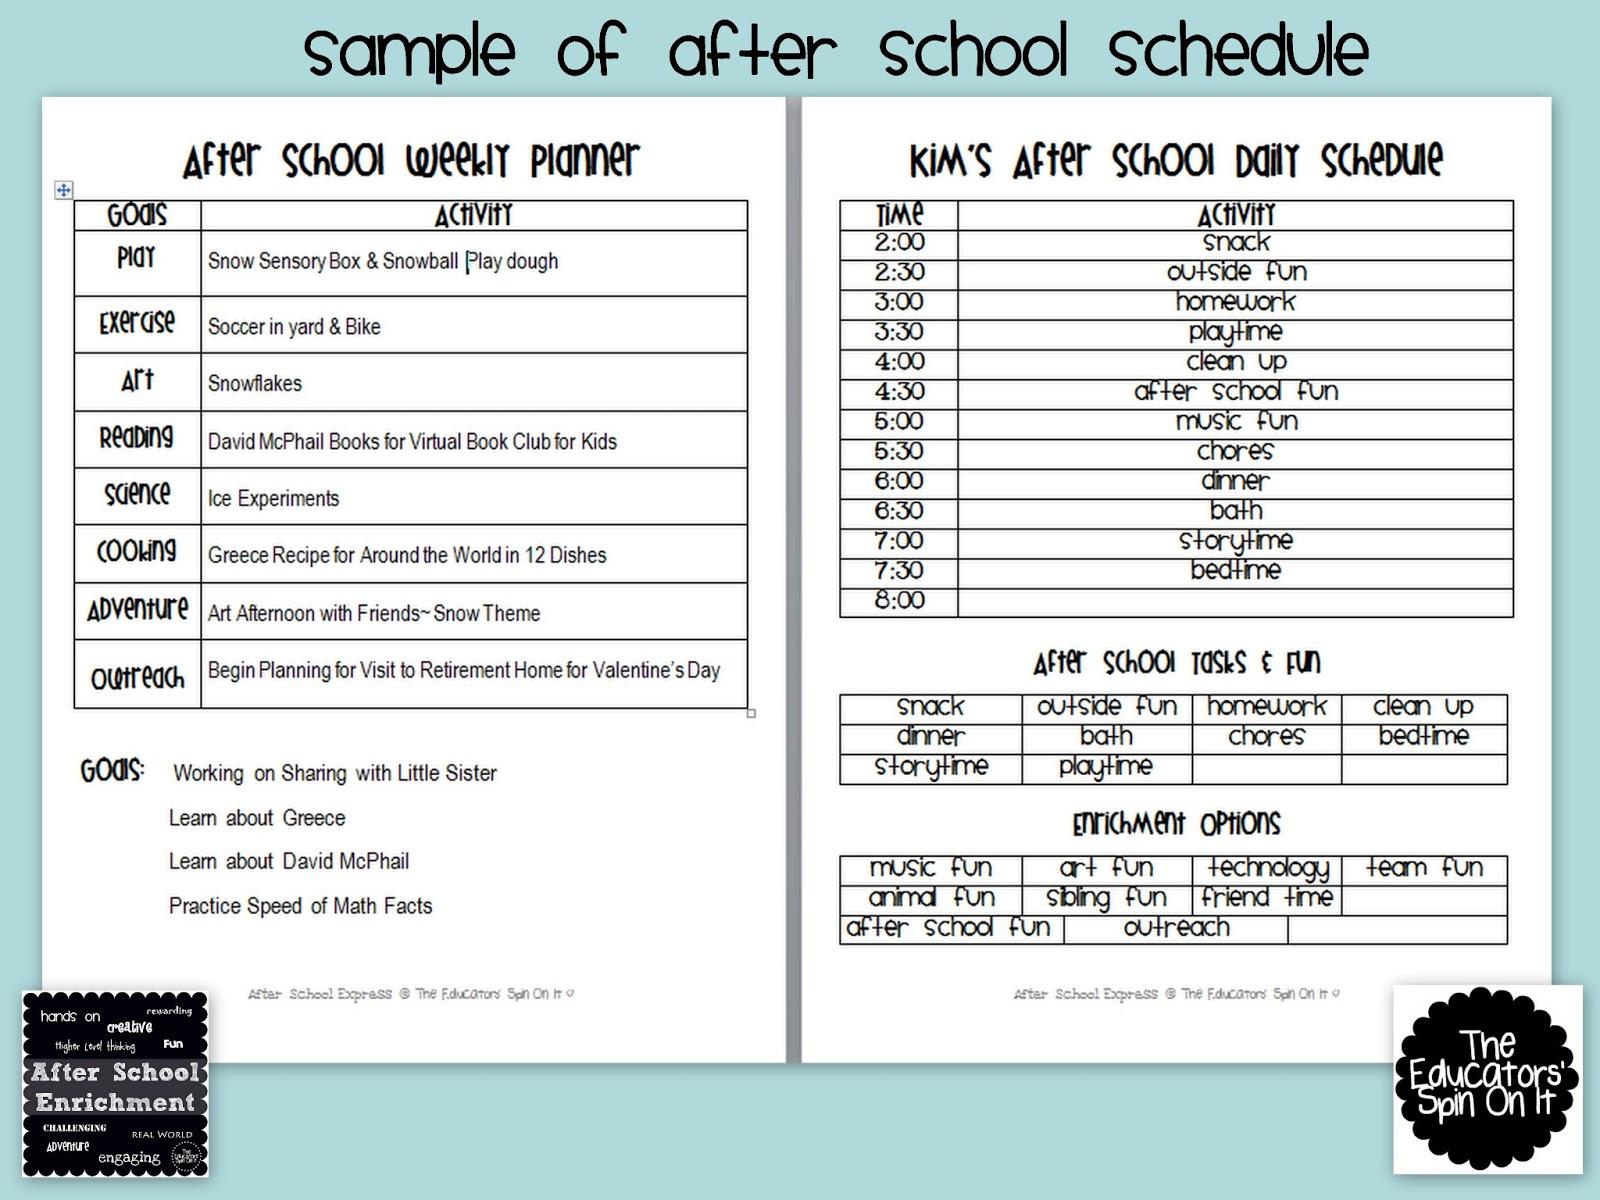 After School Weekly Planner